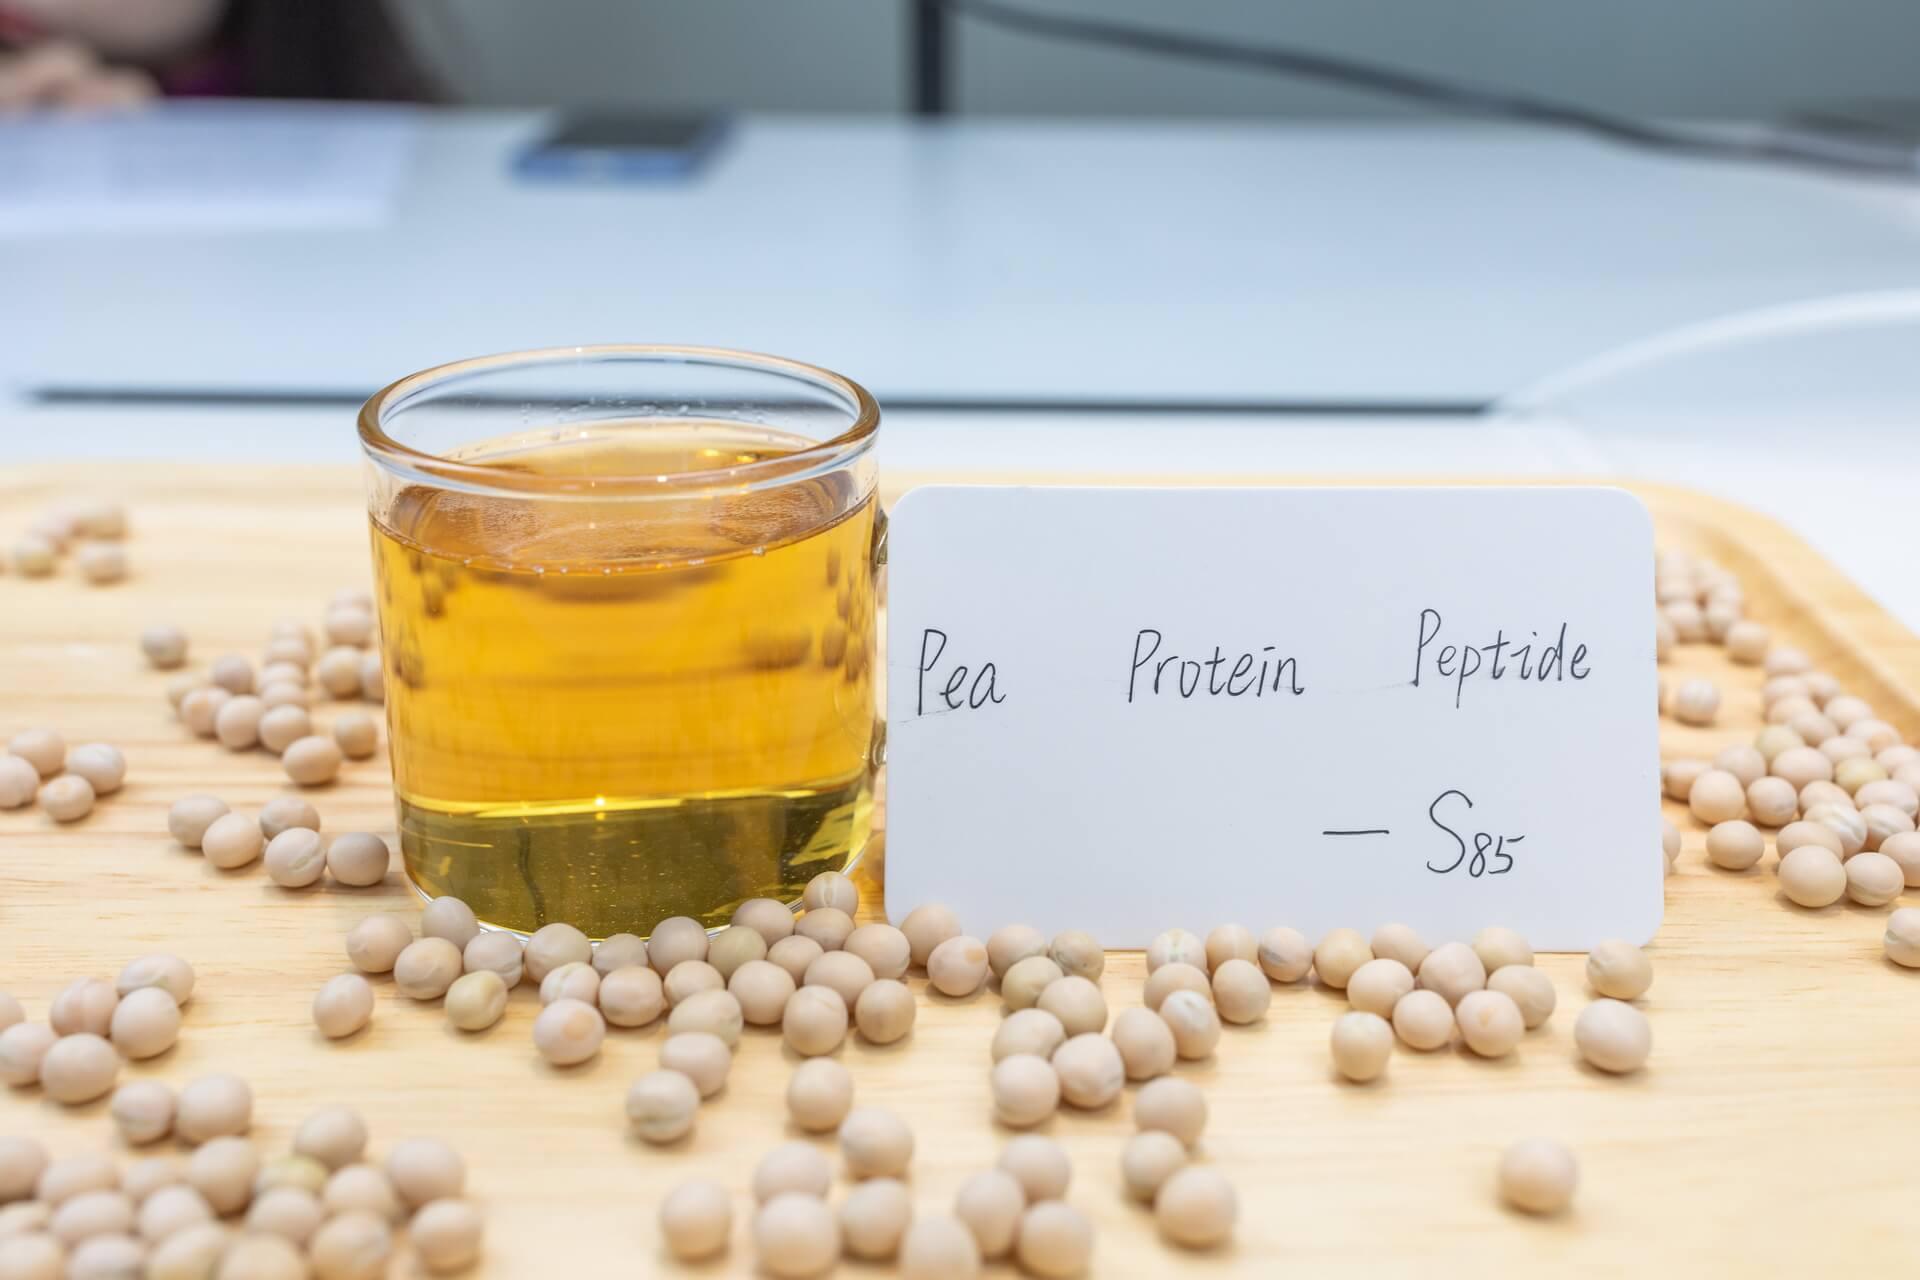 Hua Thai protein TDS- hydrolyzed pea protein S85B